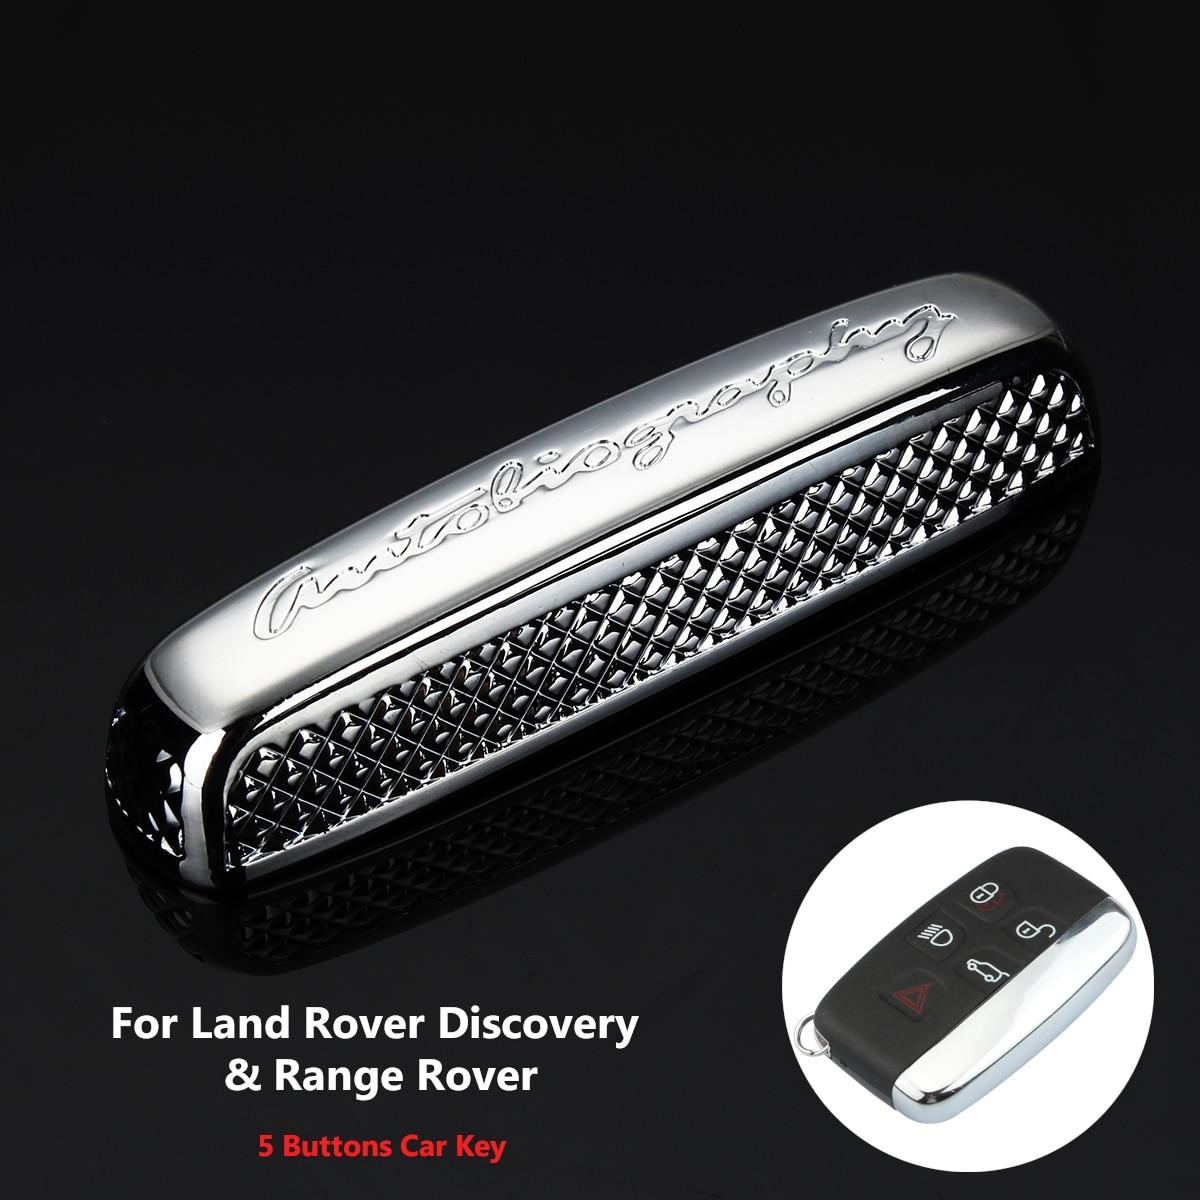 Funda de 5 botones para llave inteligente de coche, carcasa para llave remota para Range Rover para Land Rover Discovery Sport Discovery 4 Freelander 2